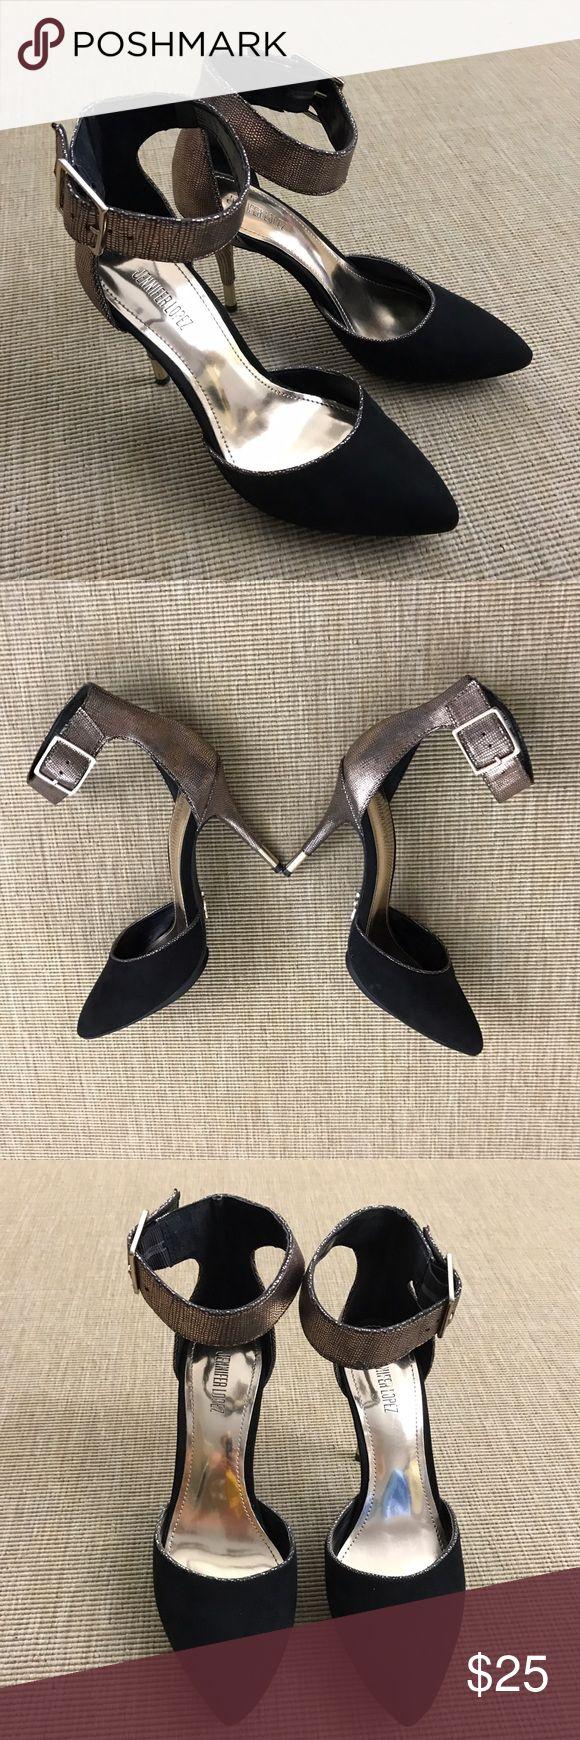 Jennifer Lopez Black Leather Gold Stilettos Sz 7 M NEW Jennifer Lopez Black suede stilettos  with Gold animal skin Texturing. Sz 7 M. Stunning and sexy. Jennifer Lopez Shoes Heels